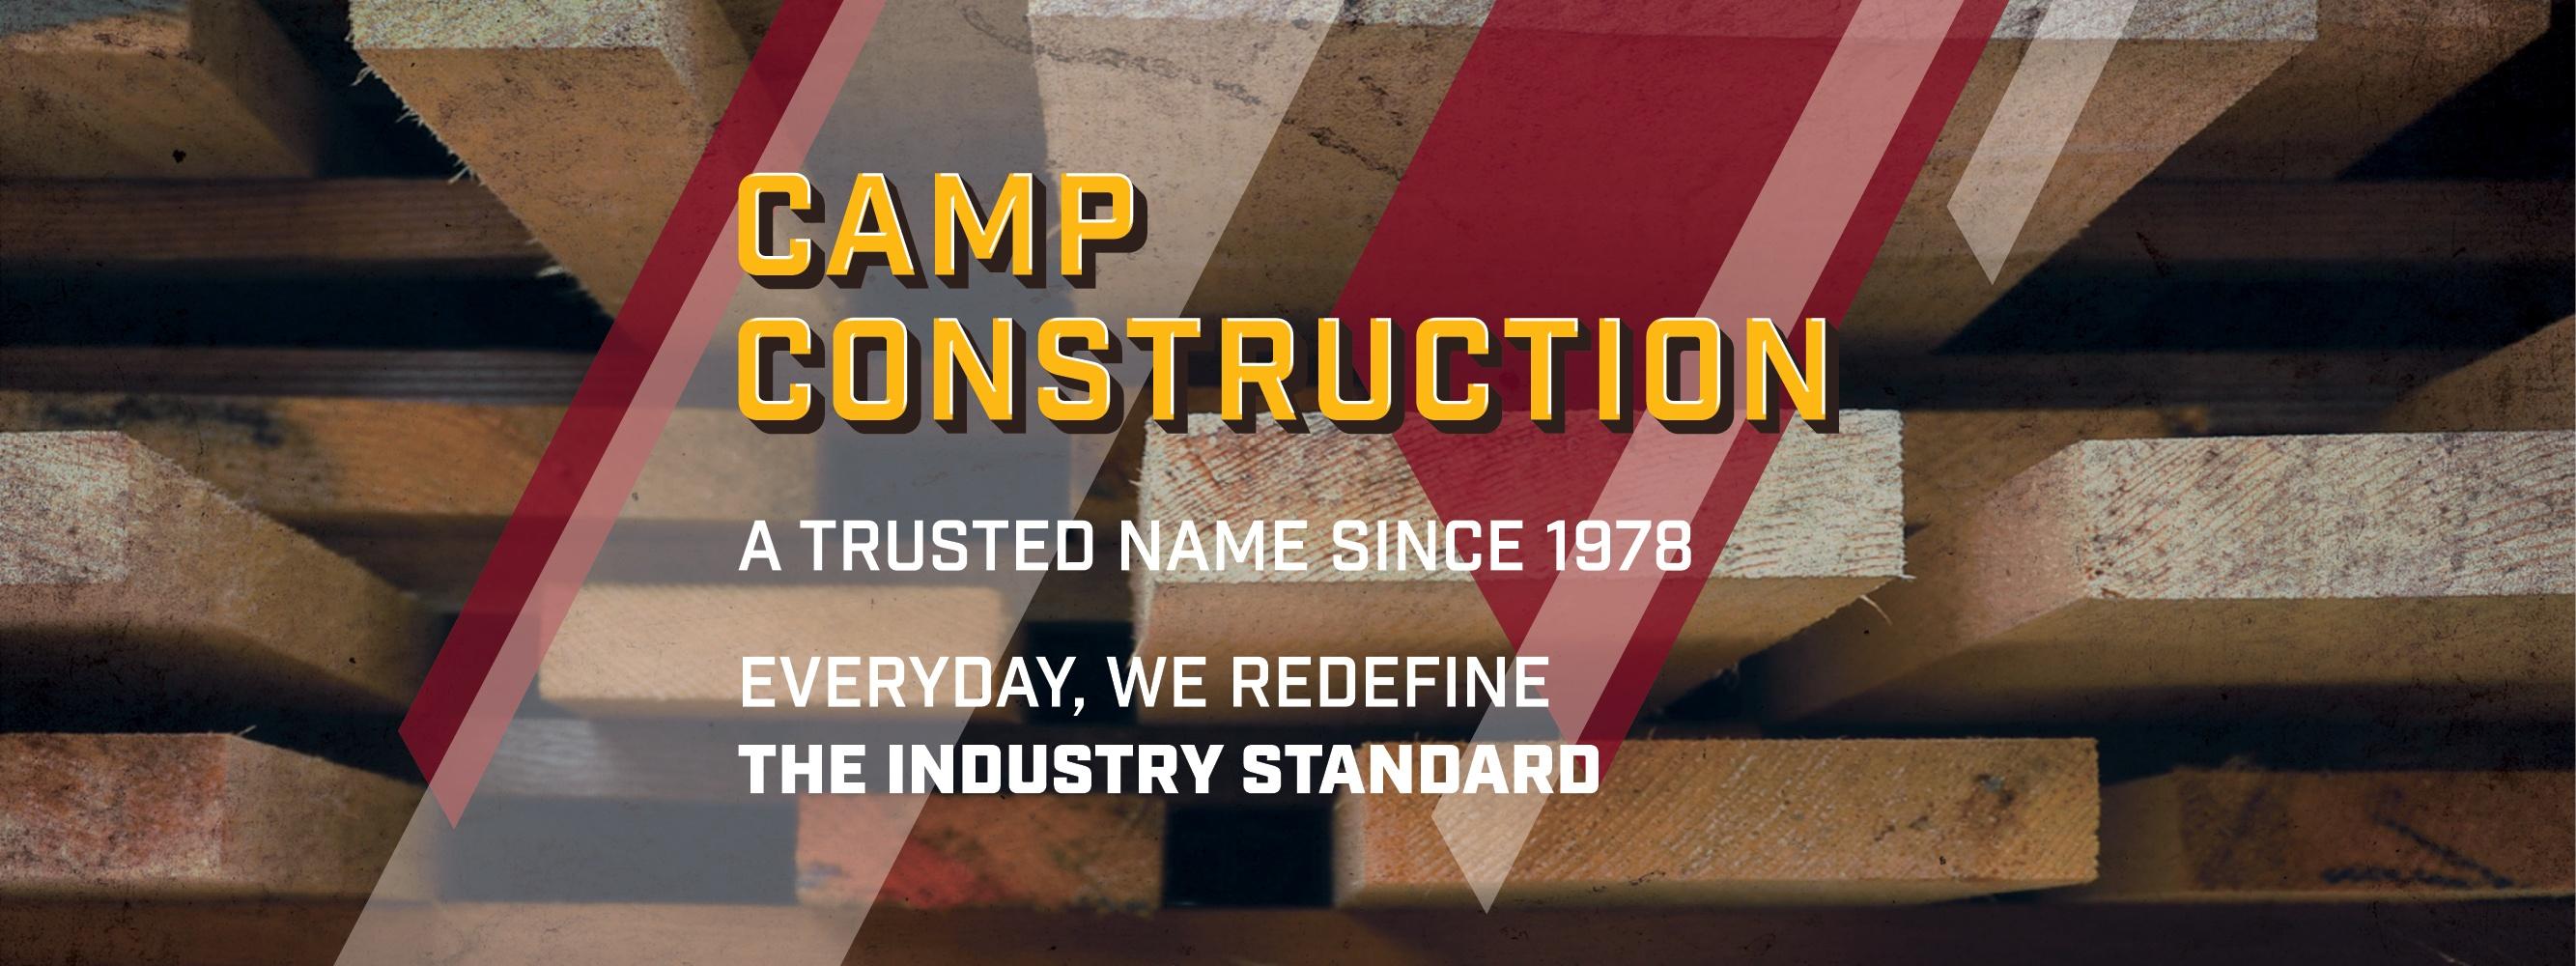 Camp Construction